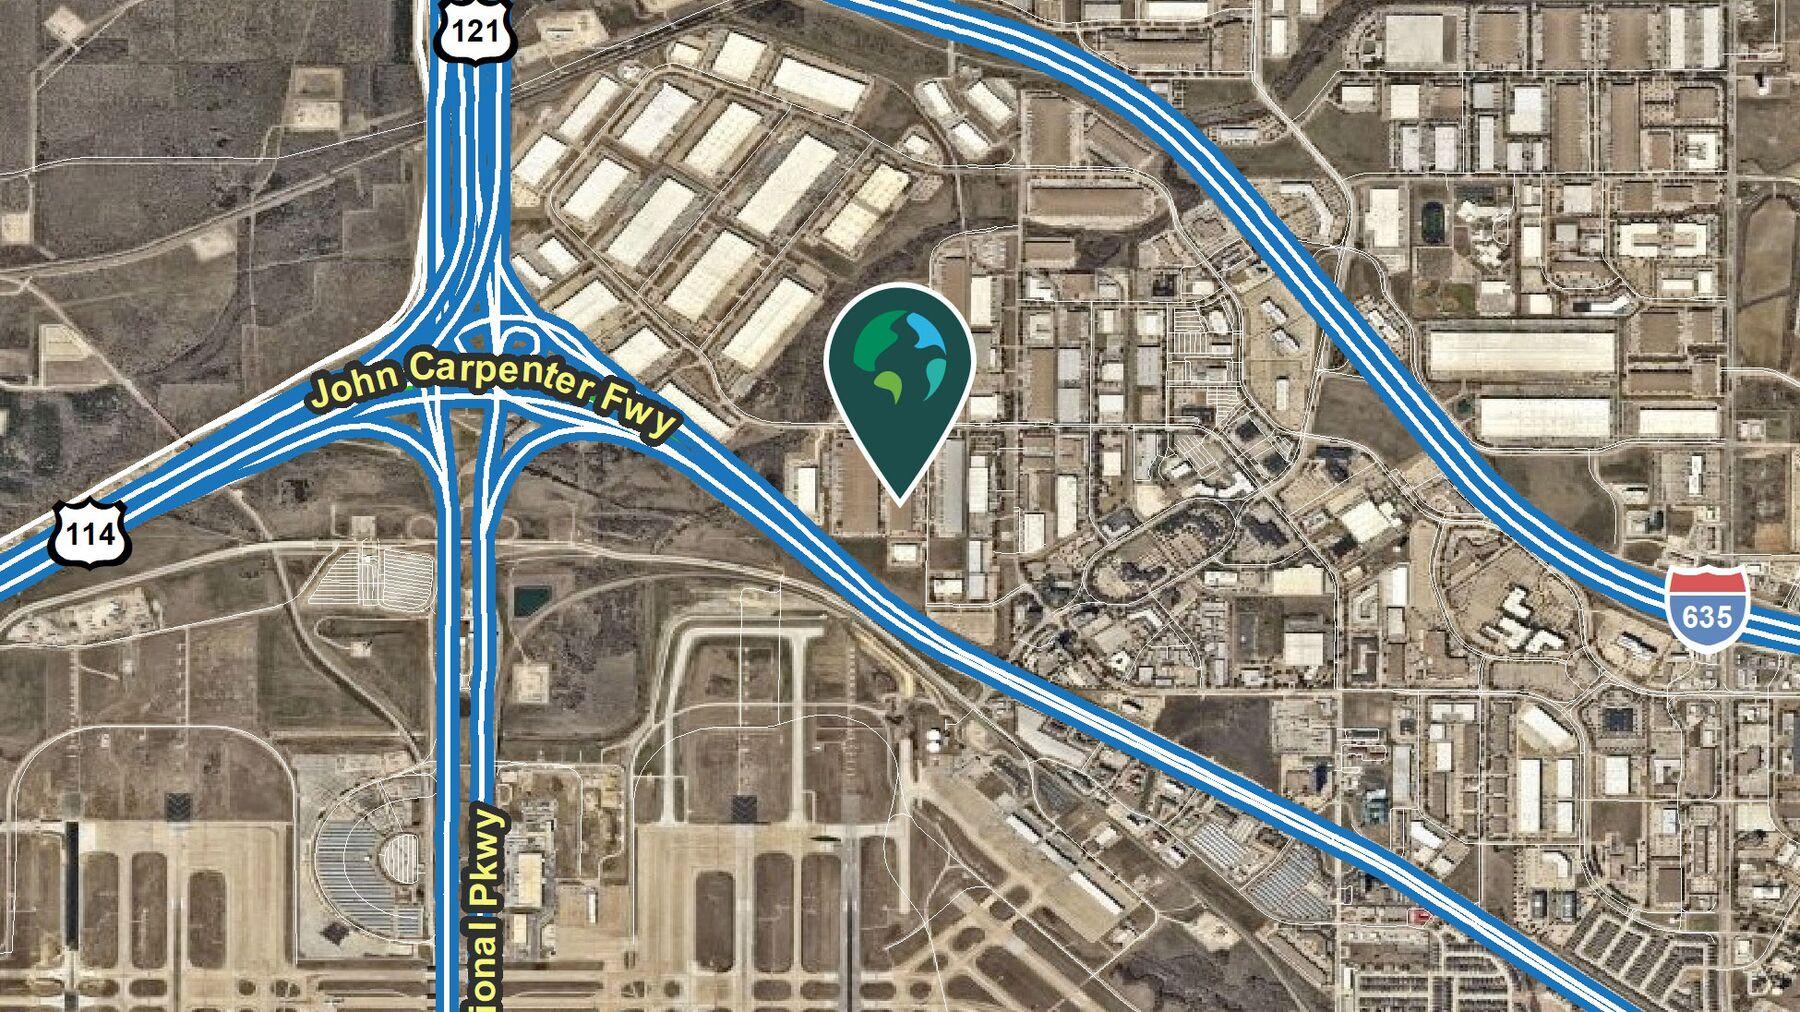 DPM-Prologis-Freeport-Dist-Ctr-6-DAL01206-1225-N-28th-Avenue_AerialMap.jpg